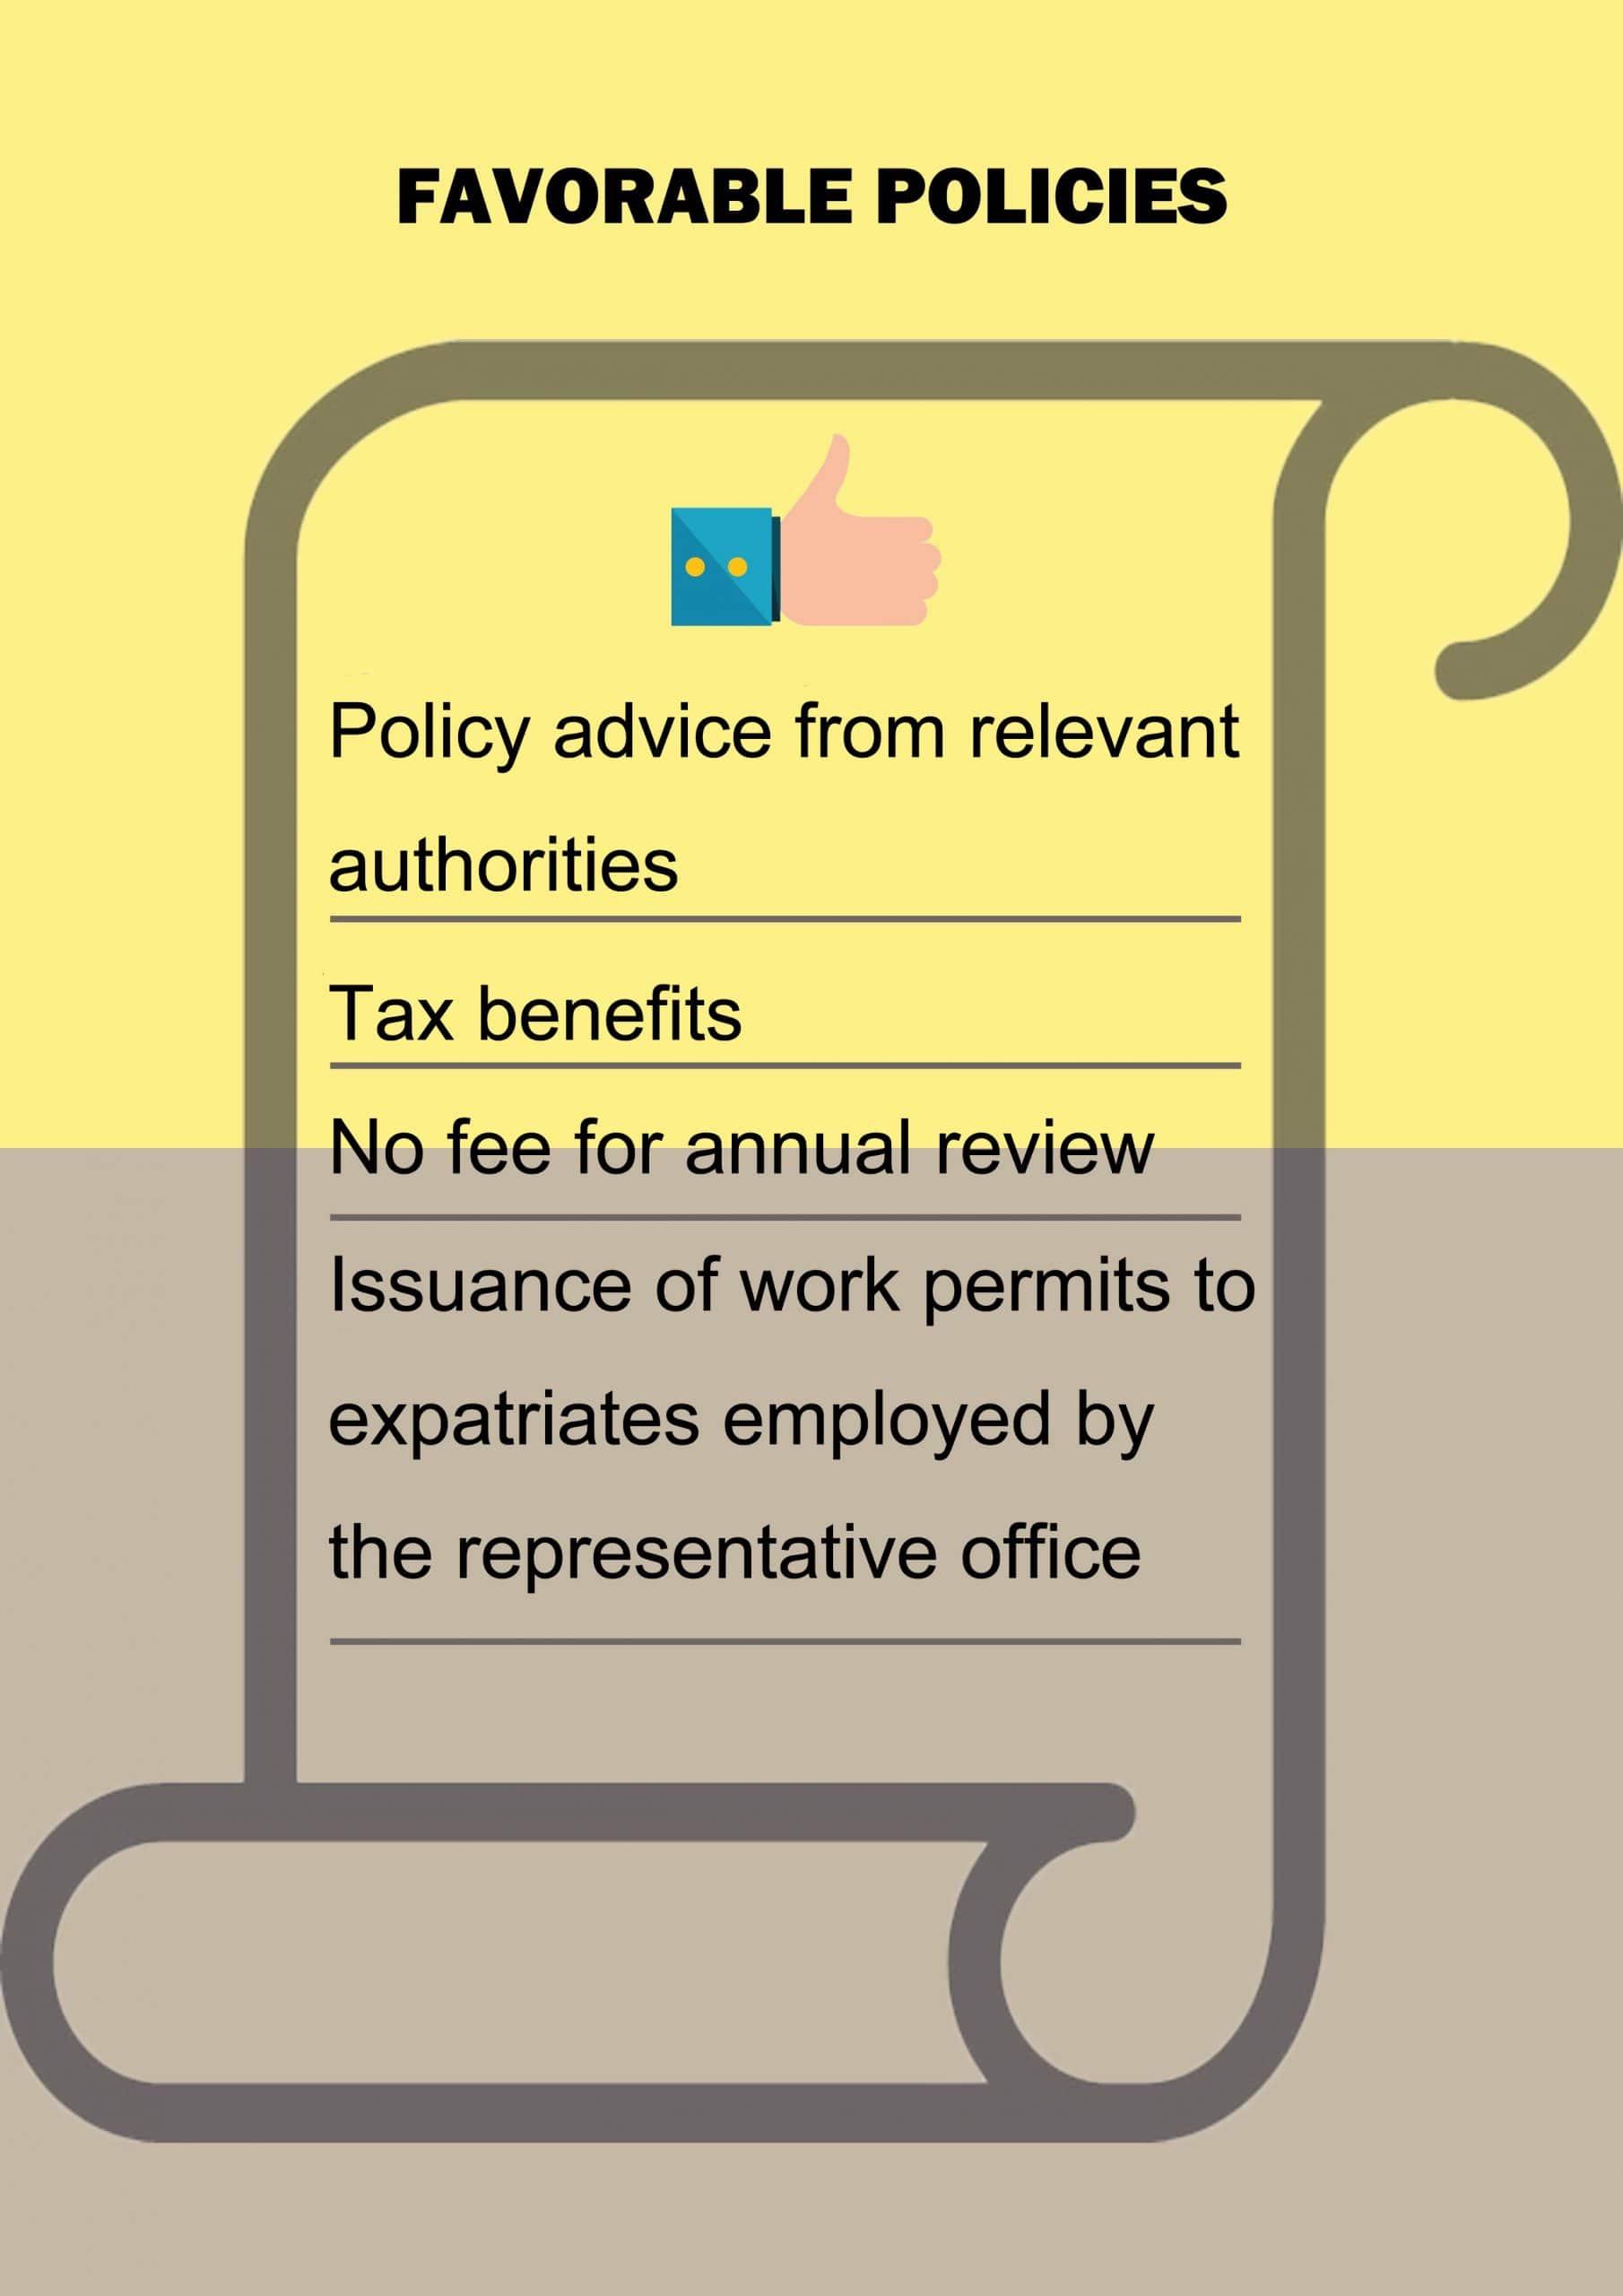 3 favorable policies